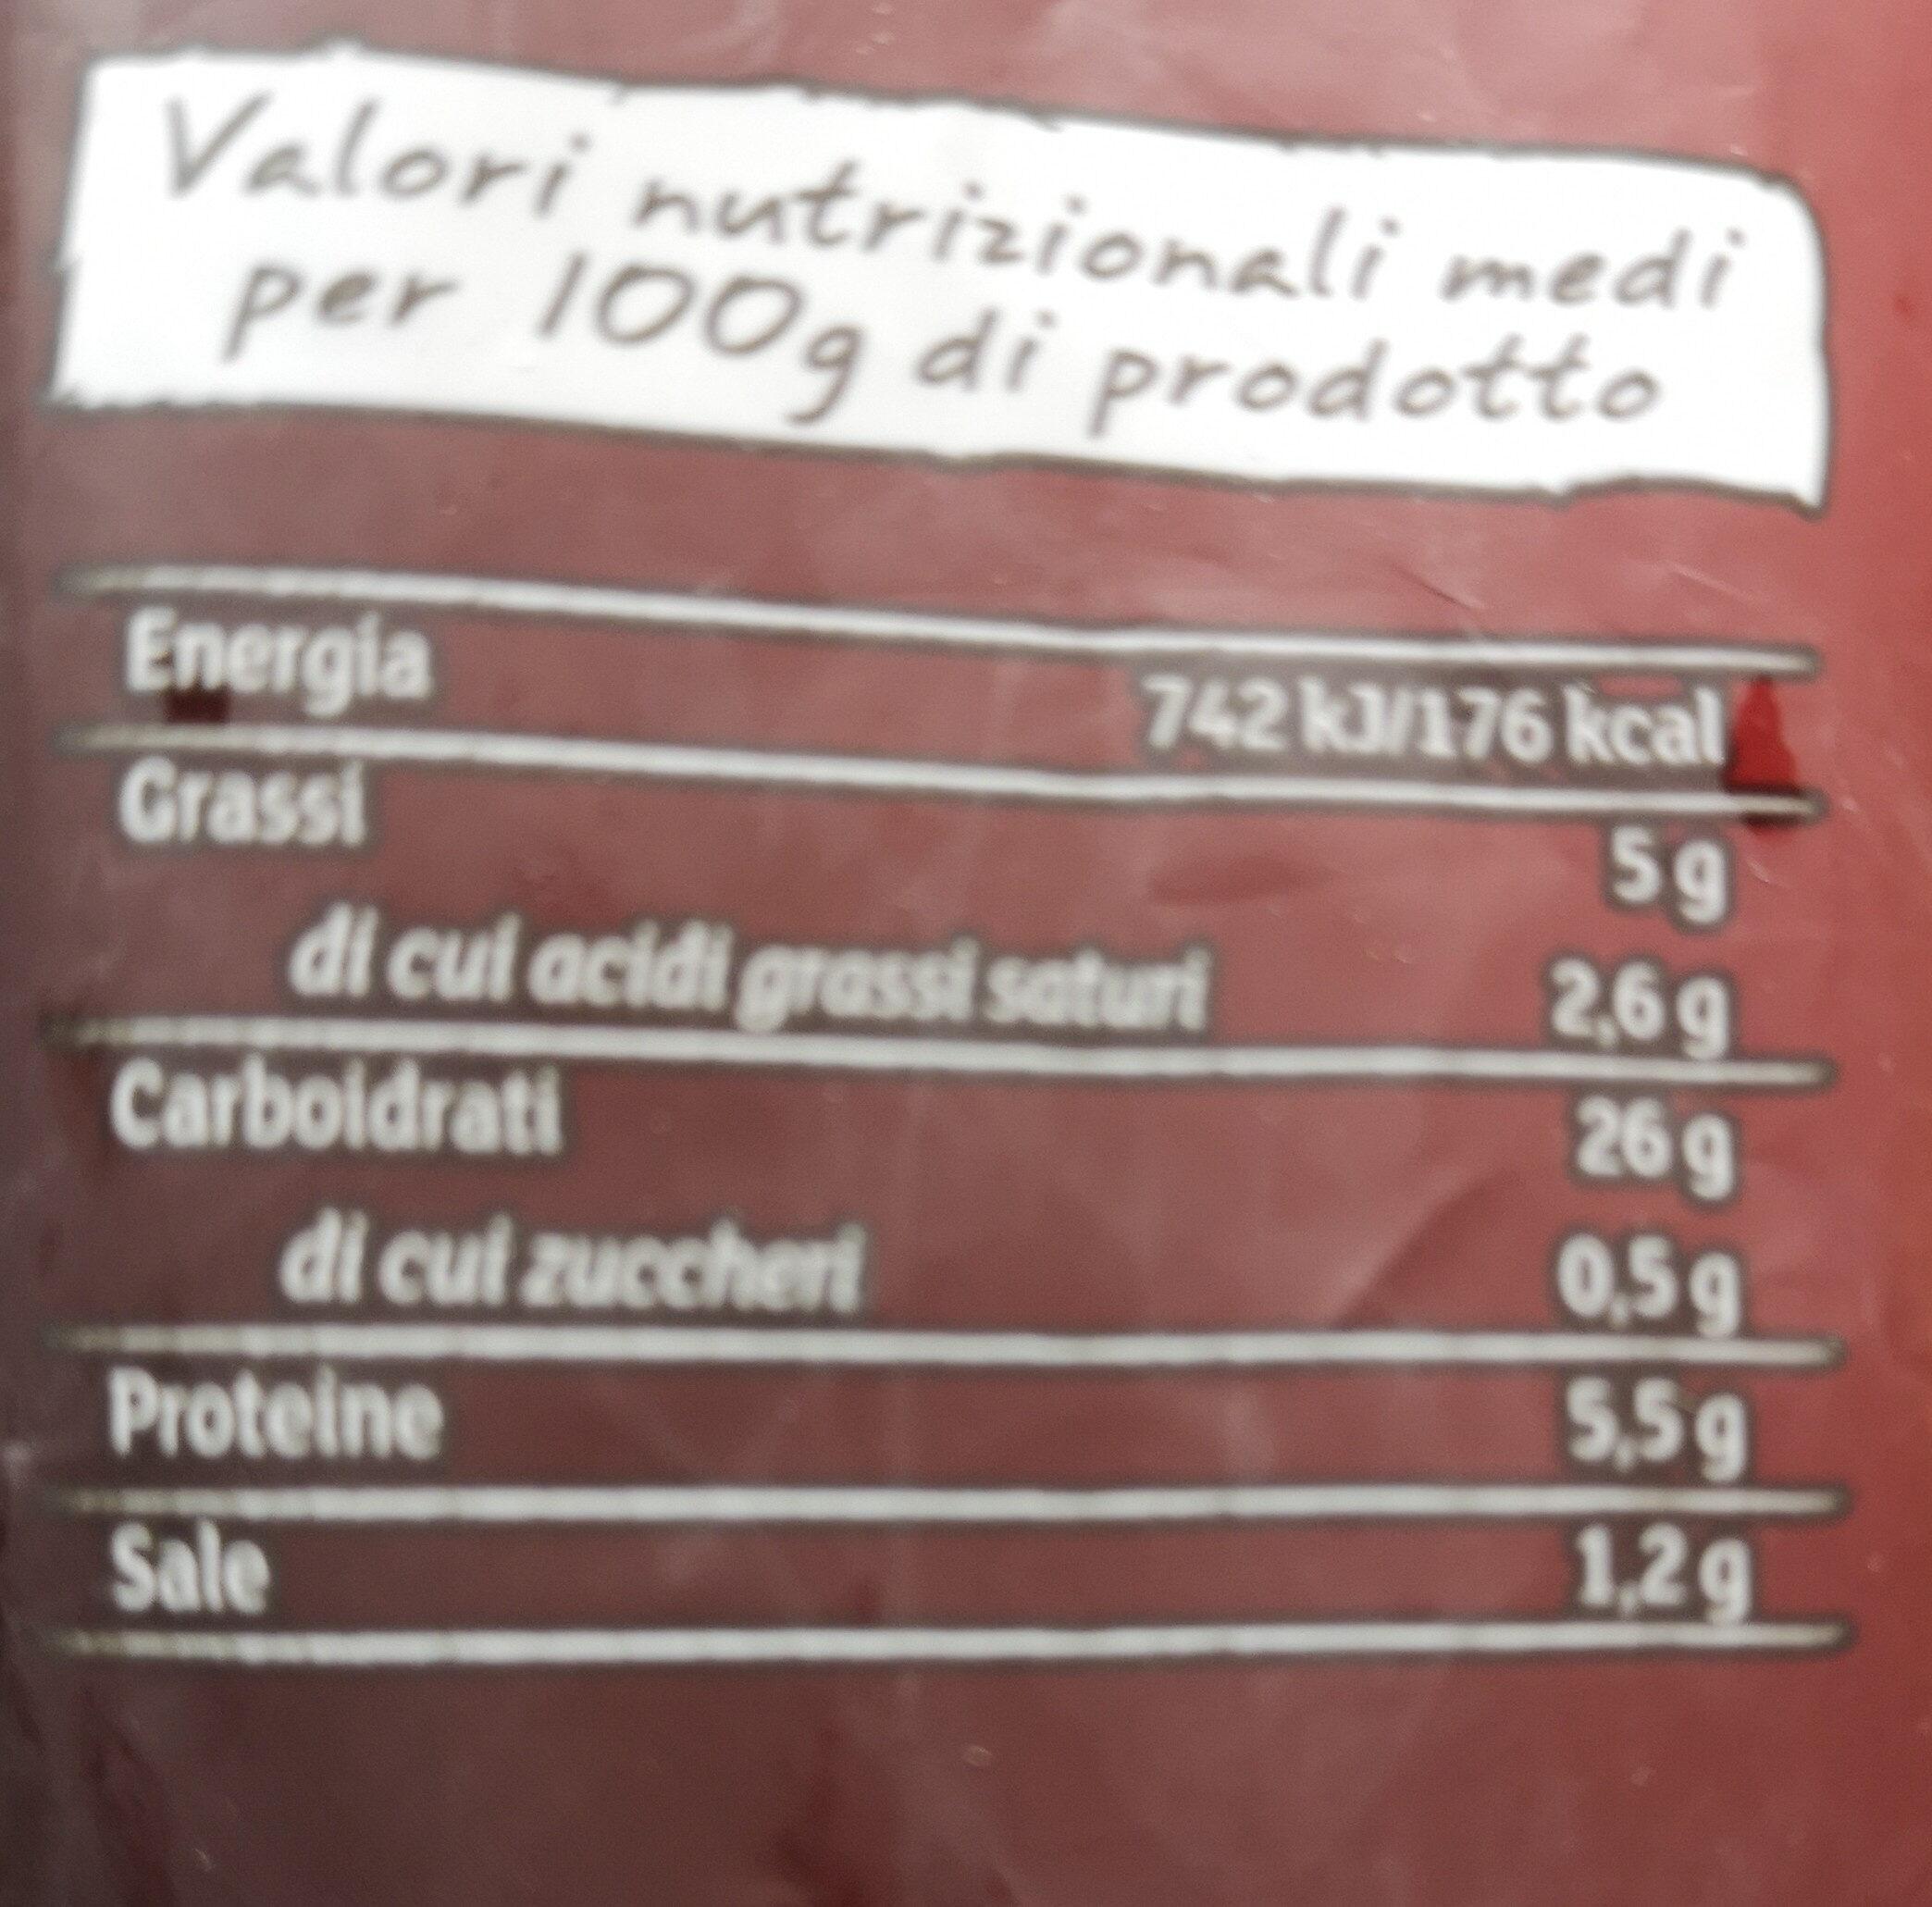 Gnocchi ripieni al Gorgonzola - Informations nutritionnelles - fr